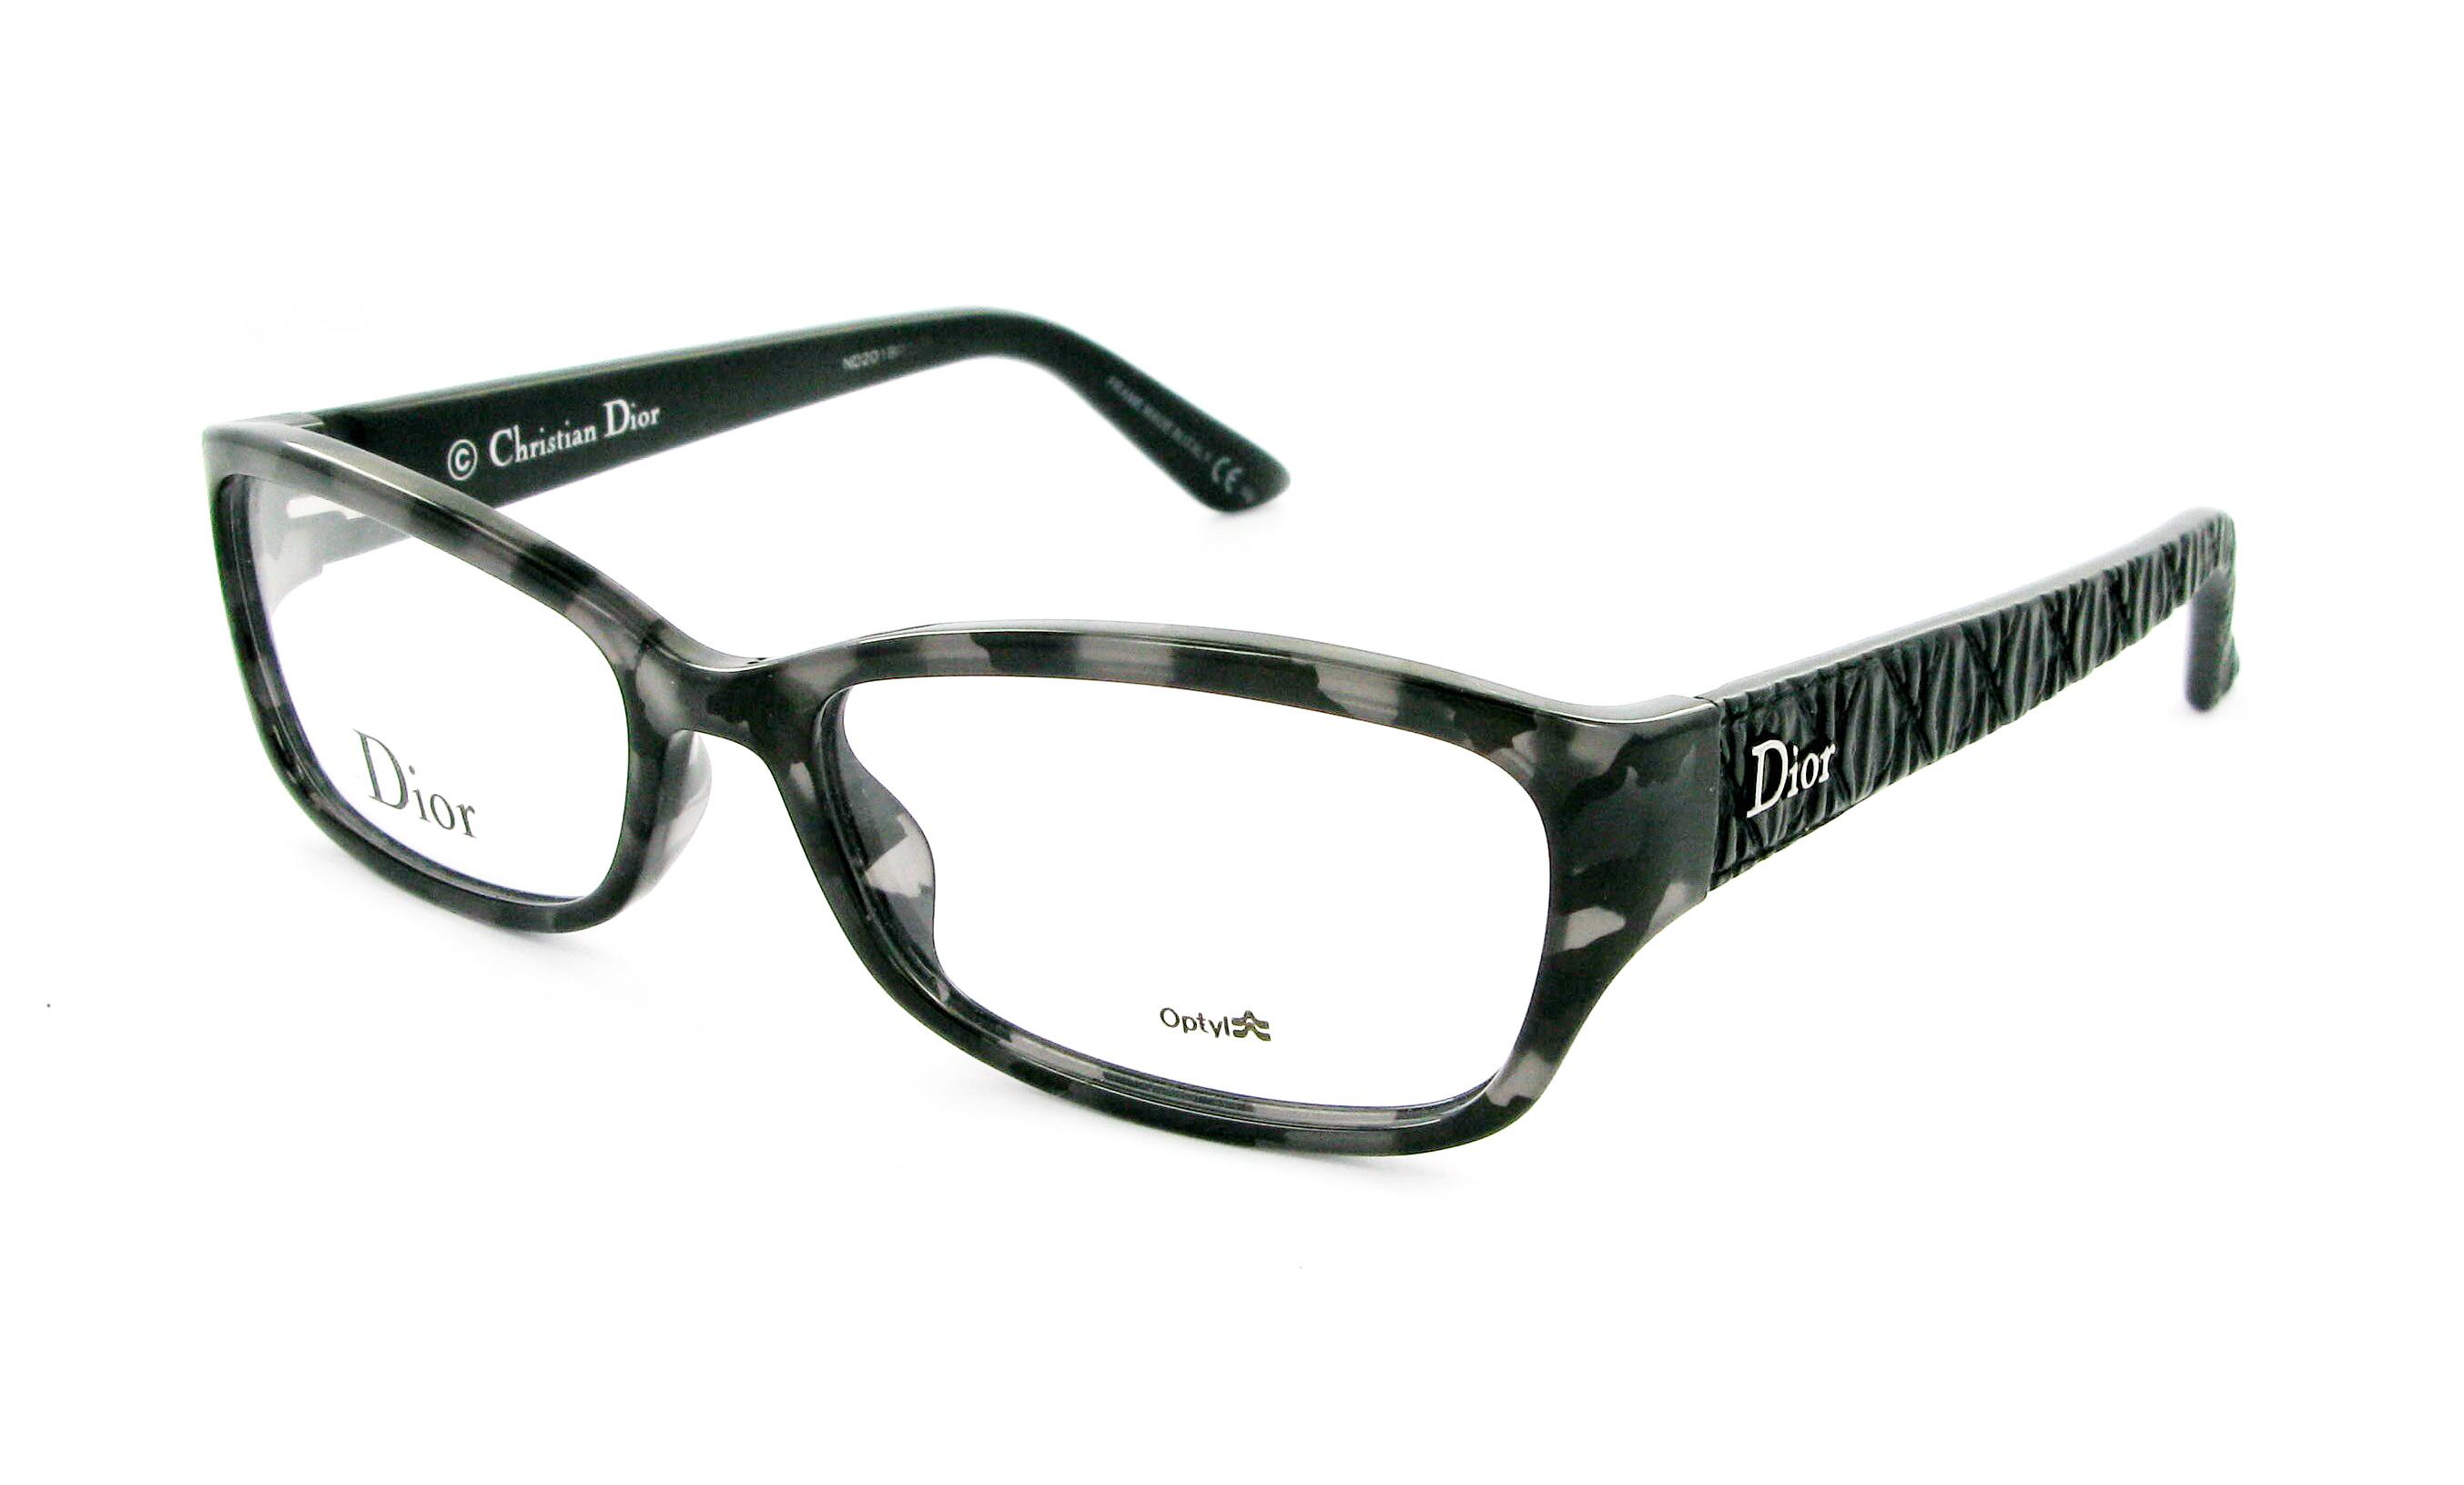 Glasses Frames Dior : Eyeglasses DIOR CD 3235 KF9 53/16 Woman Gris / Noir ...